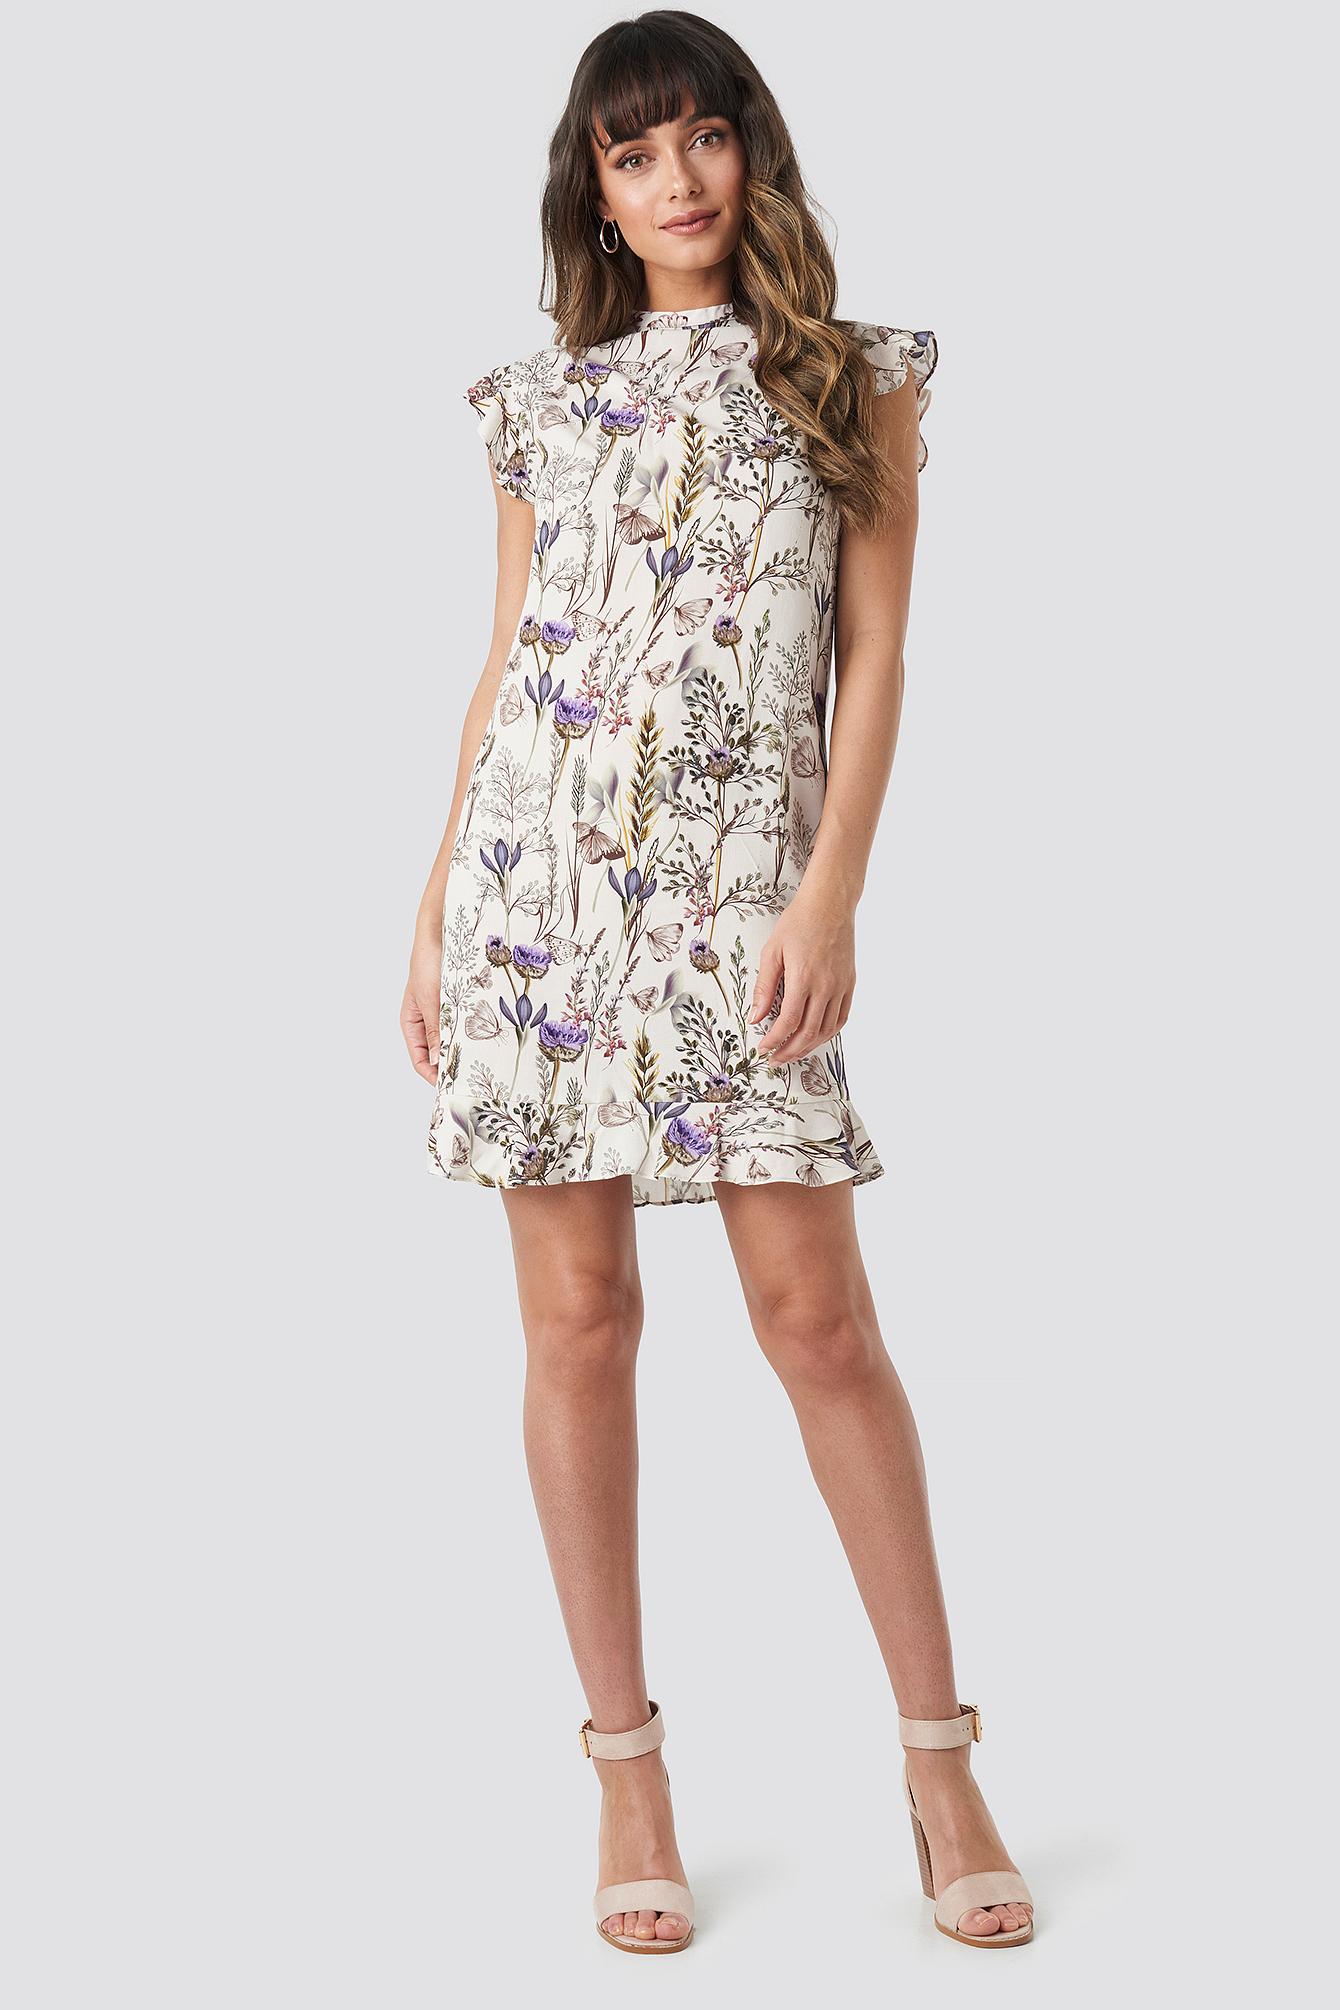 Ruffle Floral Mini Dress NA-KD.COM